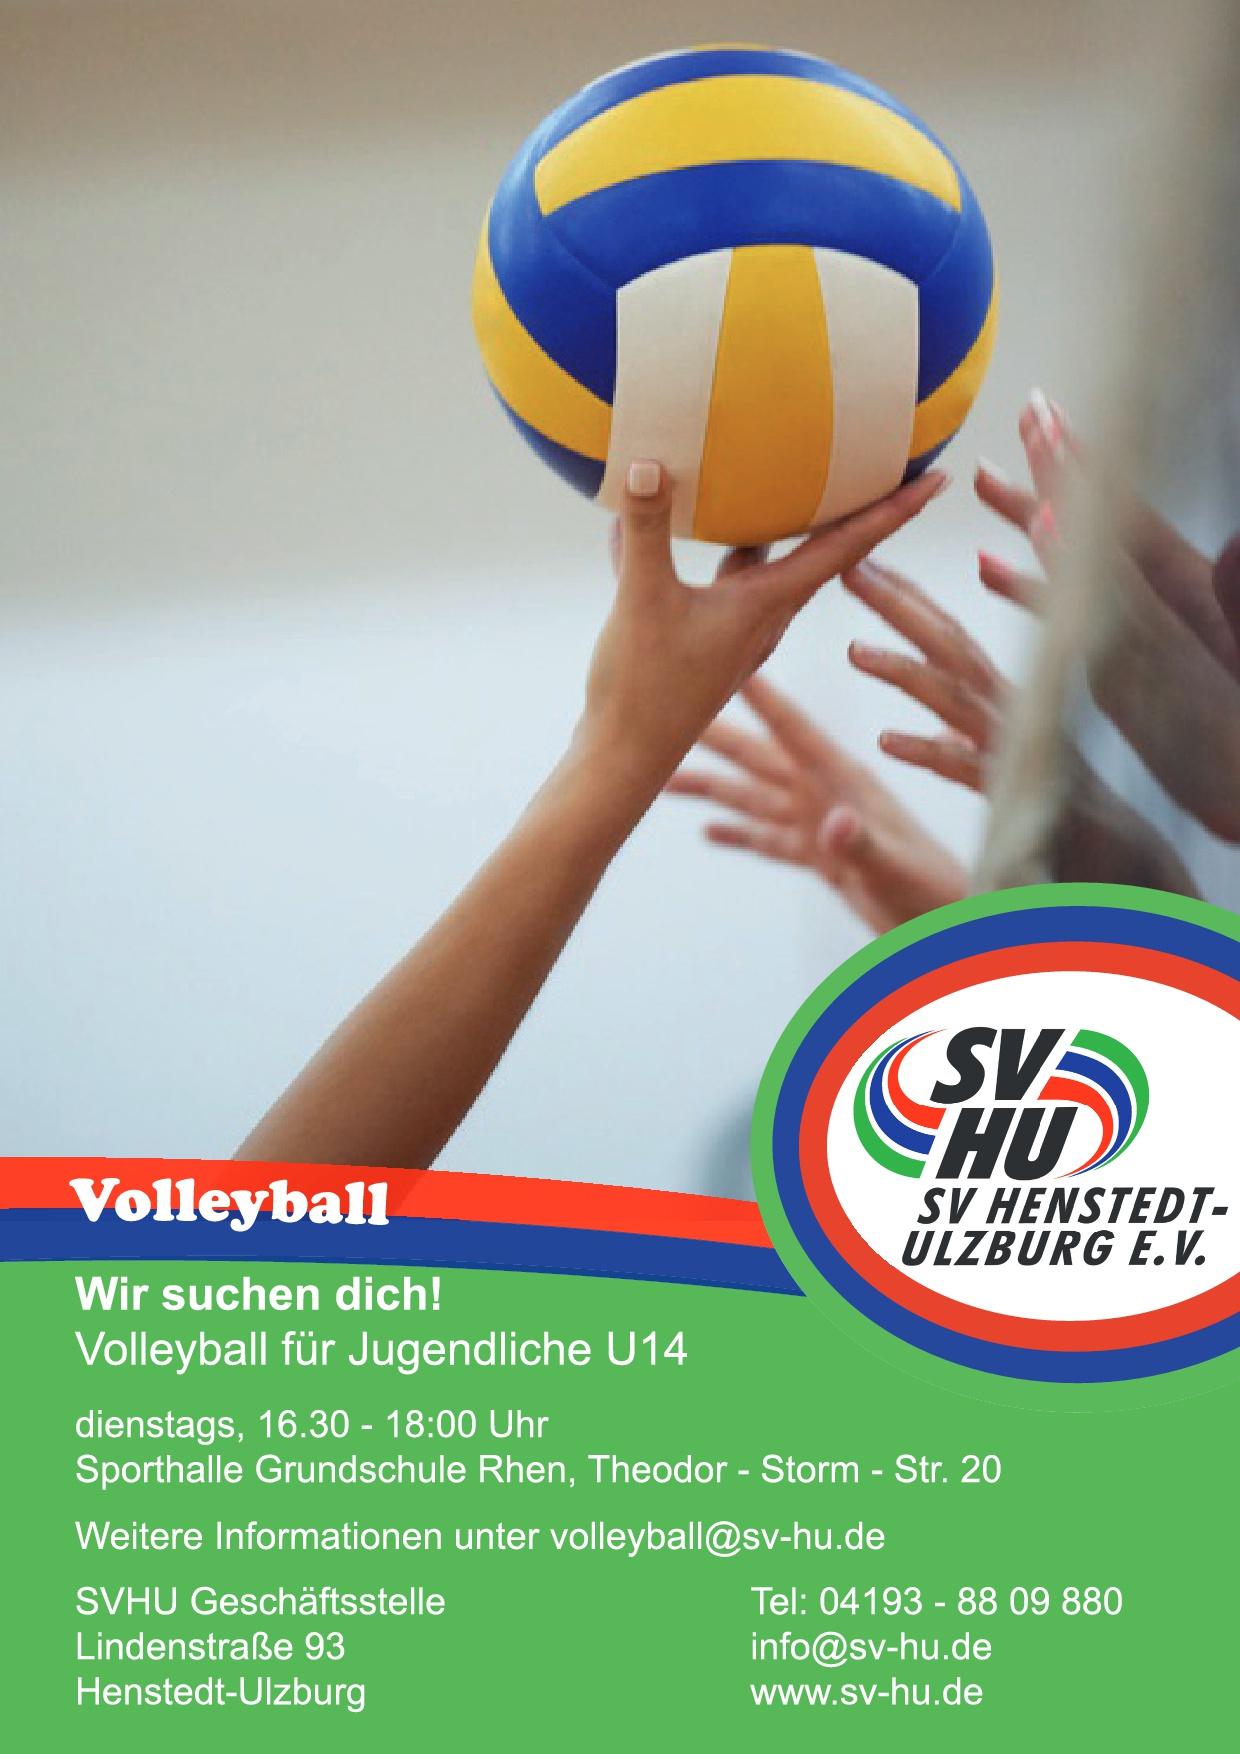 Volleyball-002-001